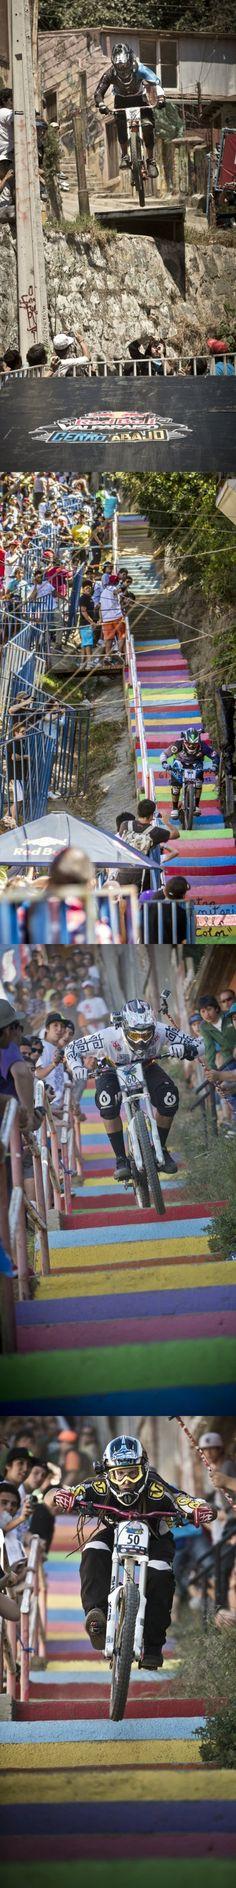 A colorful race #redbull #mtb #downhill #valparaiso